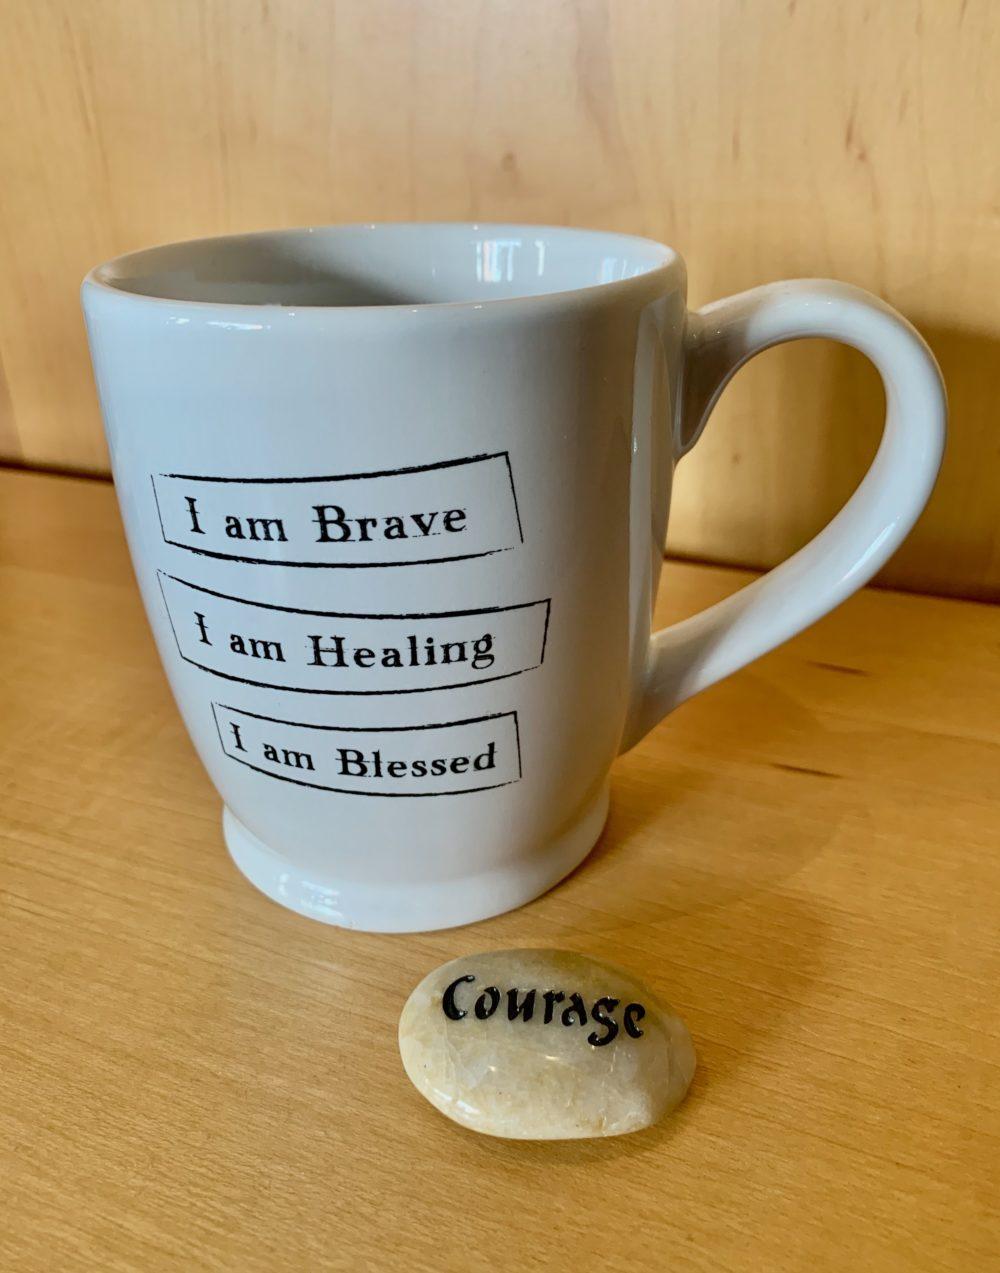 I am Brave, I am Healing, I am blessed Mantra Mug and Courage Talistone